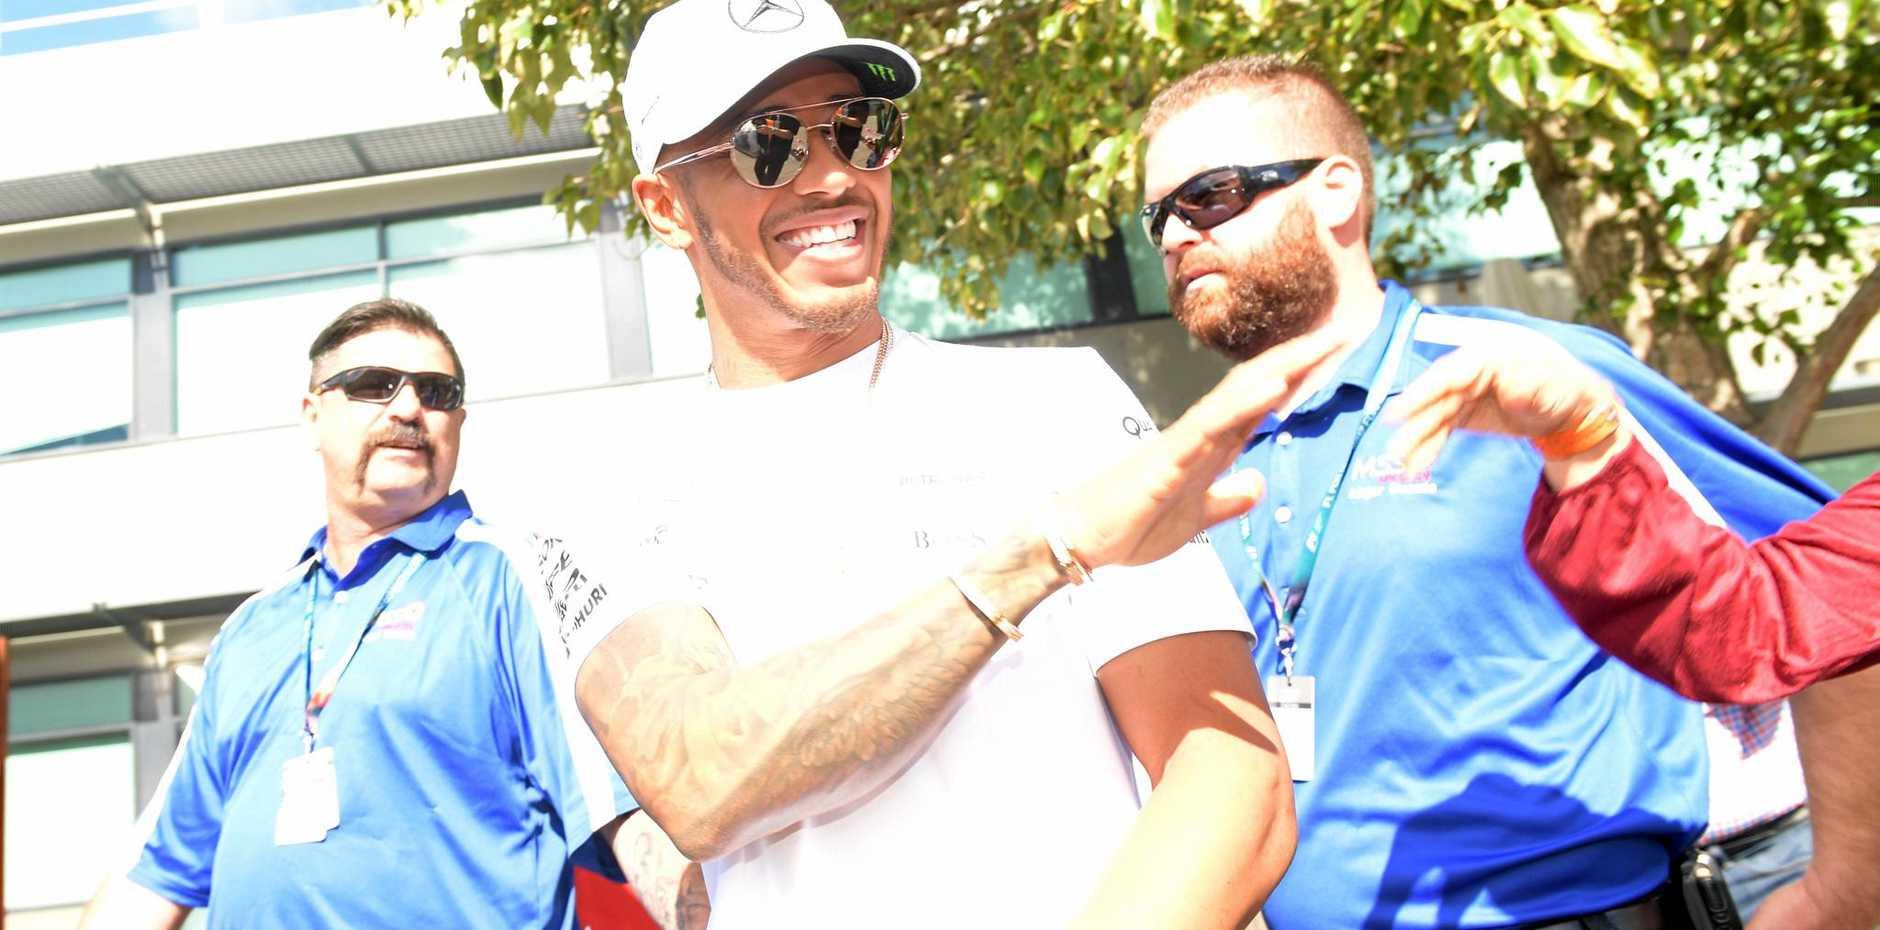 Lewis Hamilton arrives for an Australian Grand Prix qualifying session at Albert Park.